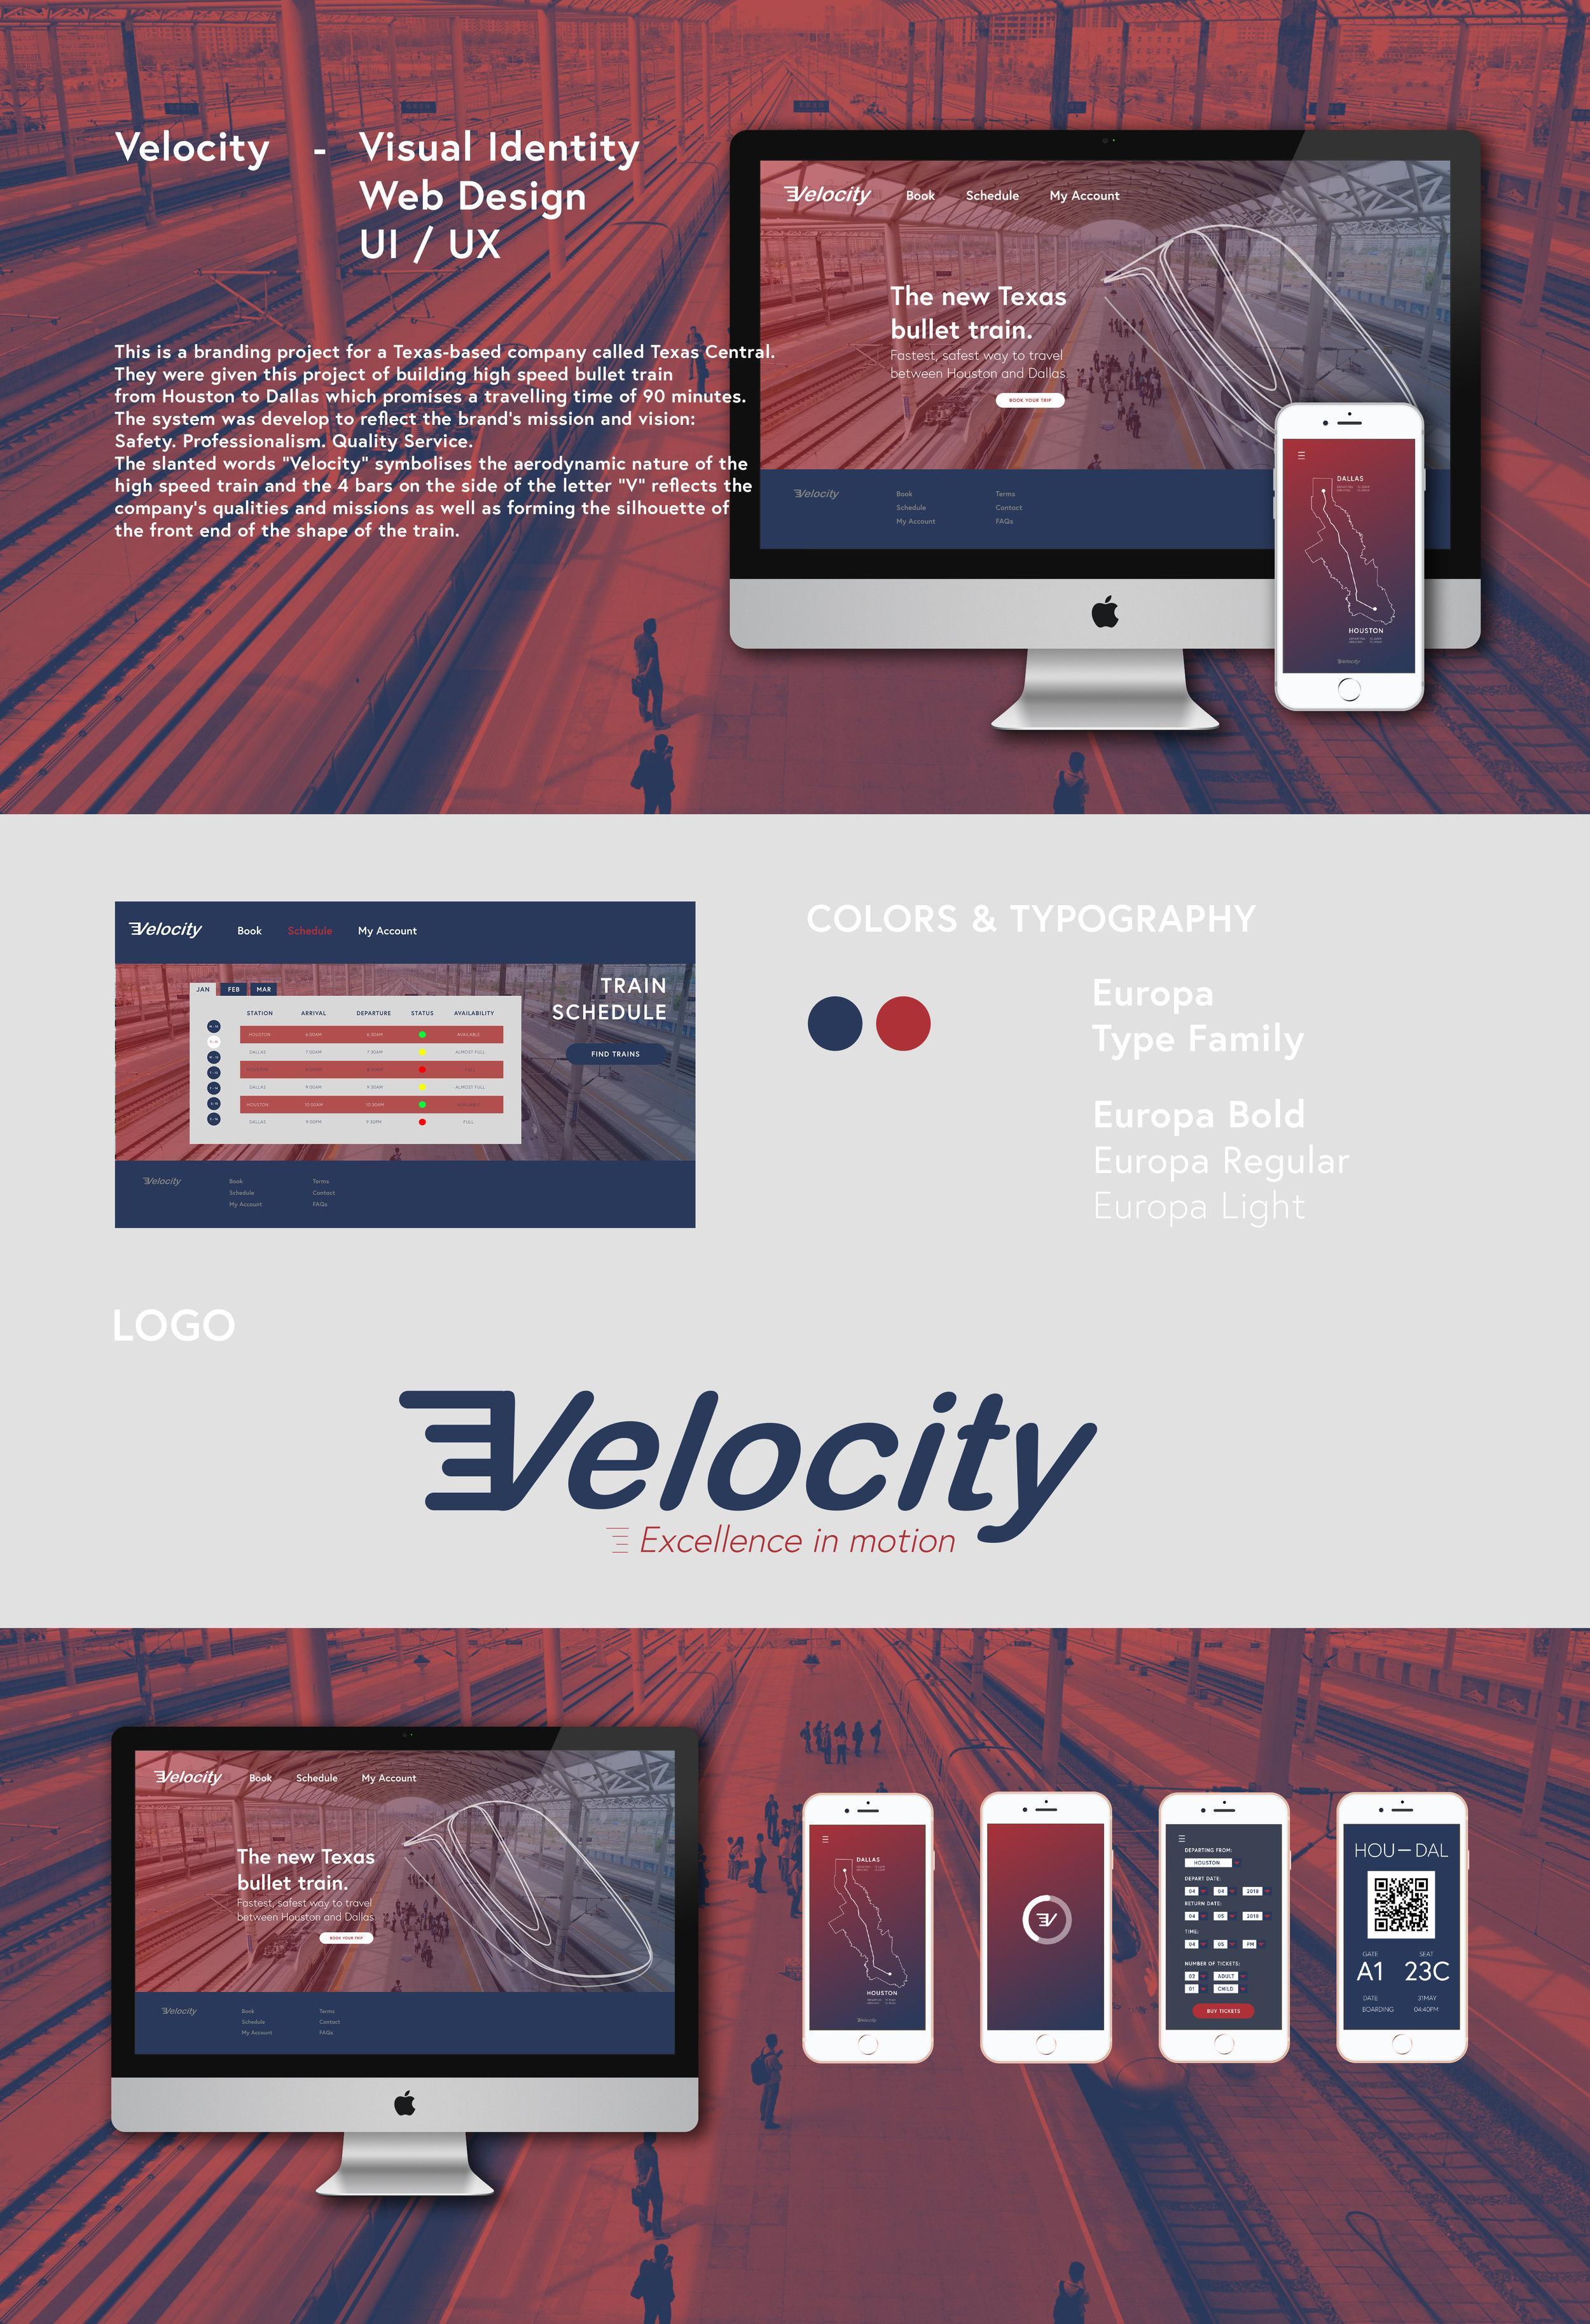 VelocityBrandingLayout.jpg